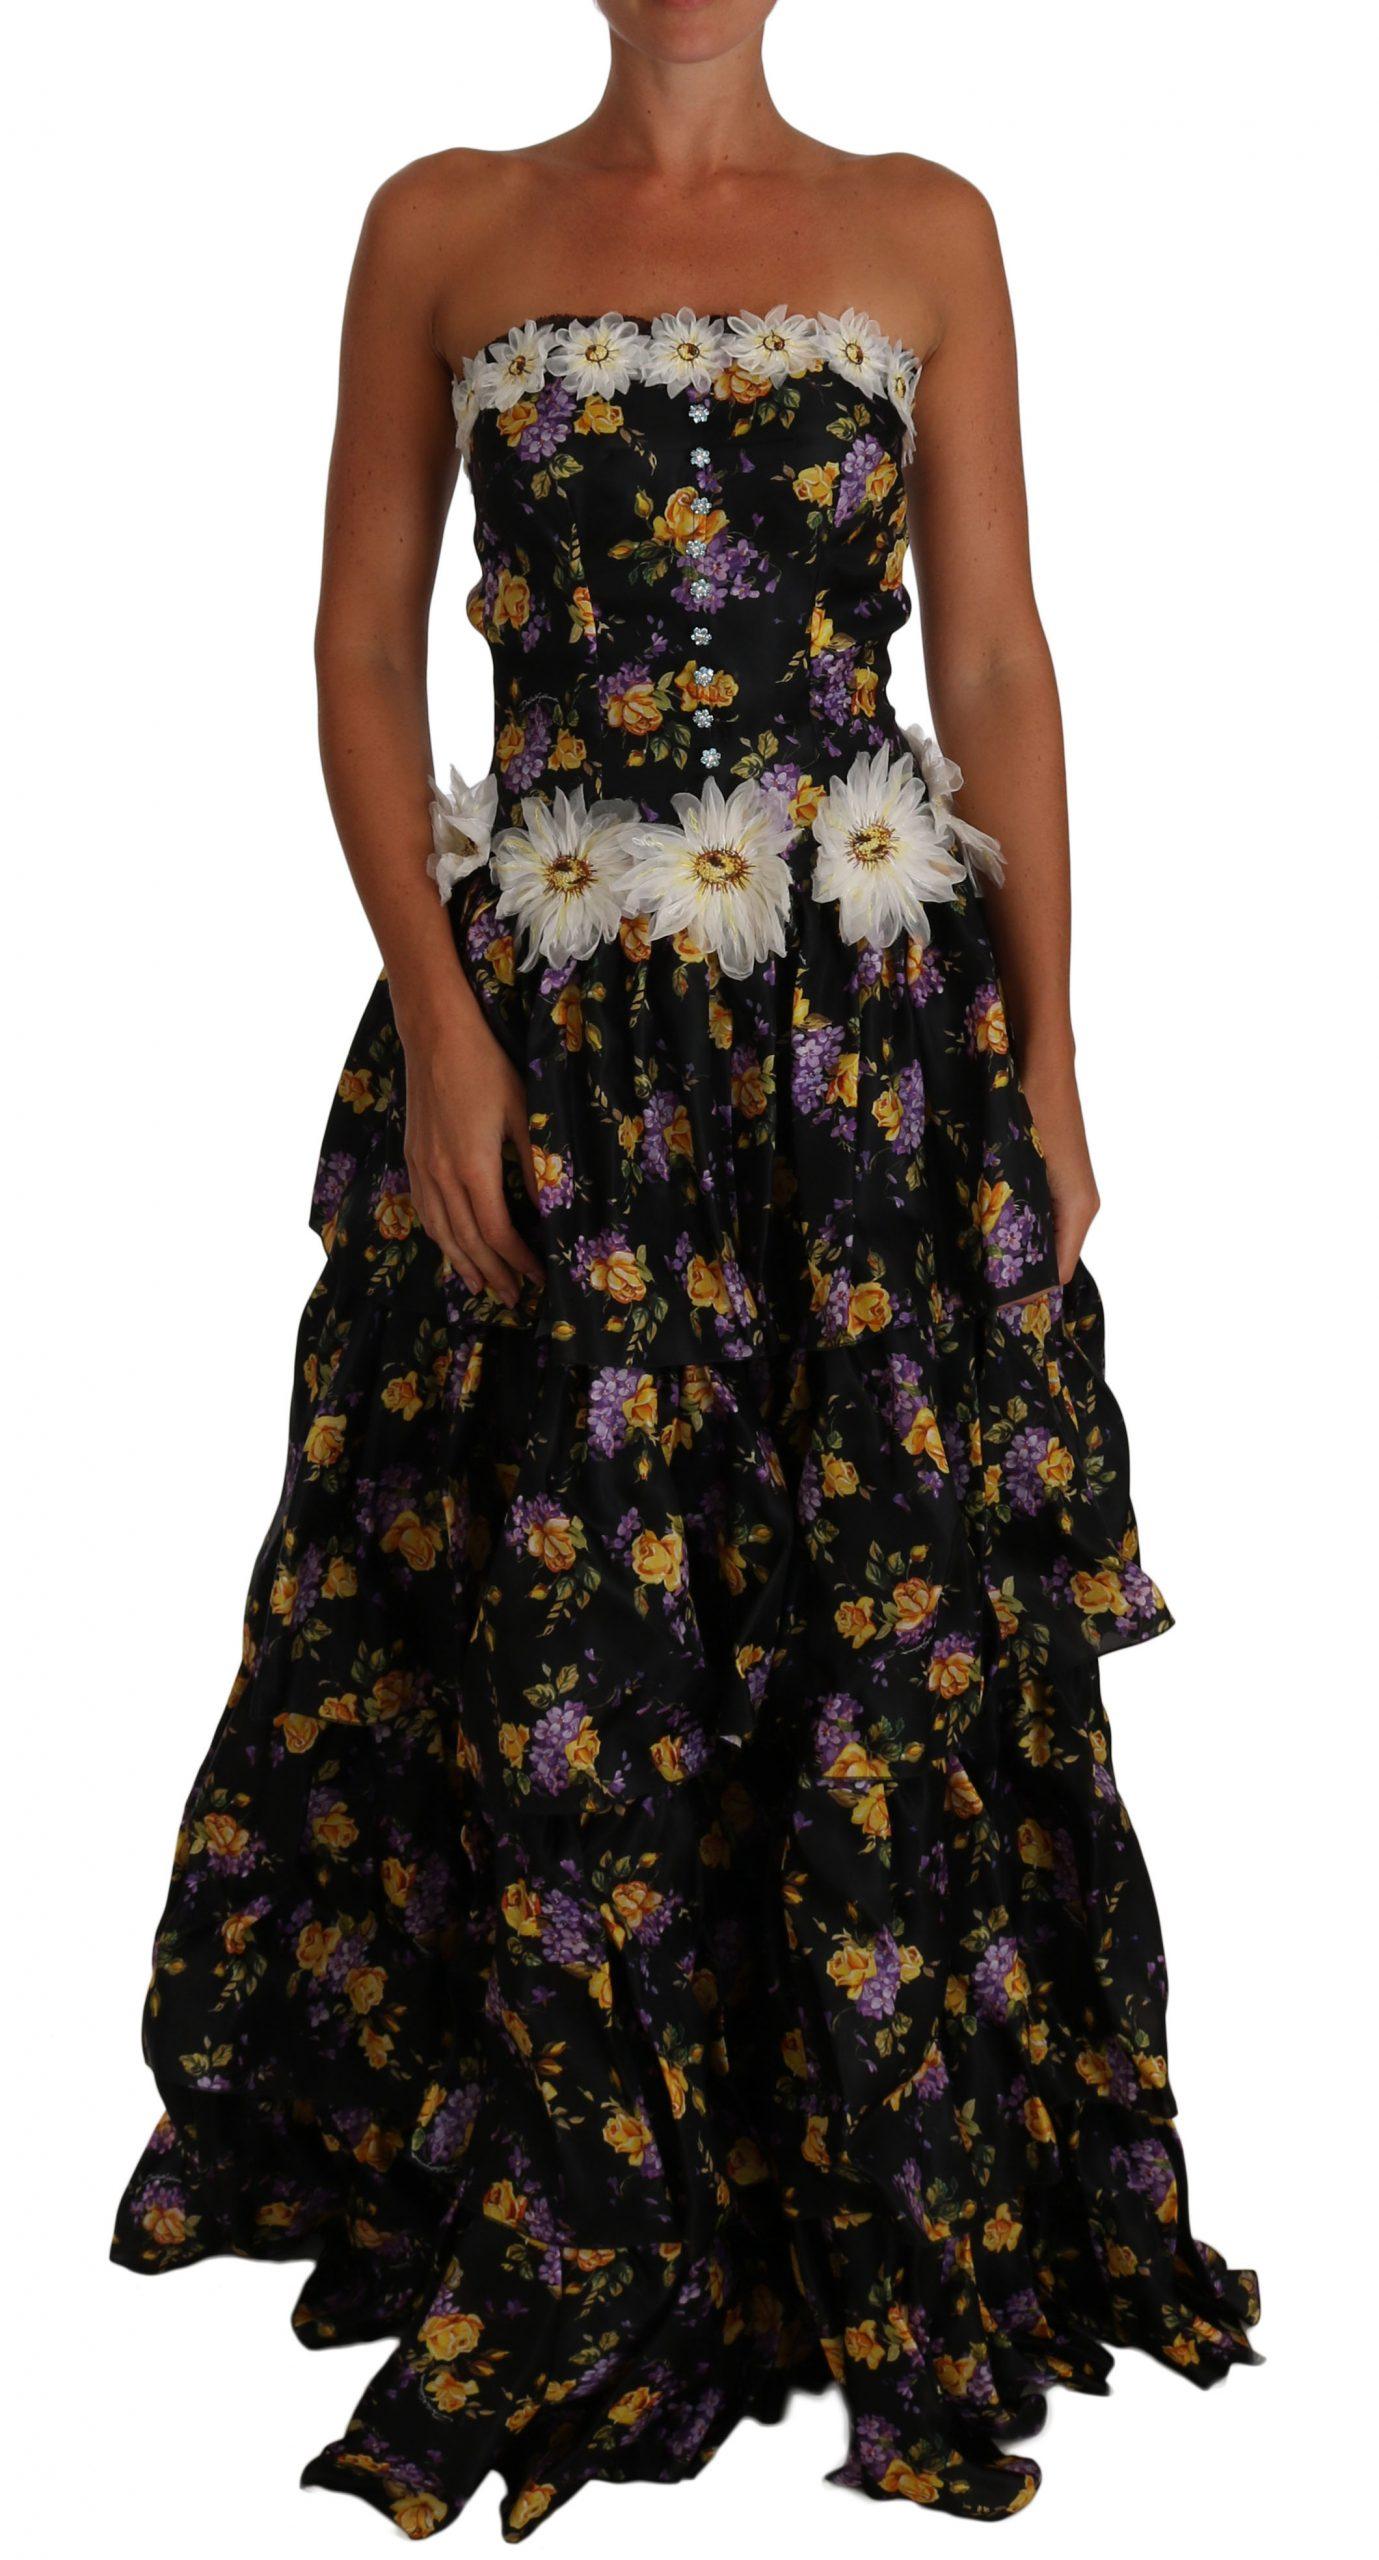 Dolce & Gabbana Women's Sartoria Ball Floral Crystal Dress DR1074 - IT36   S